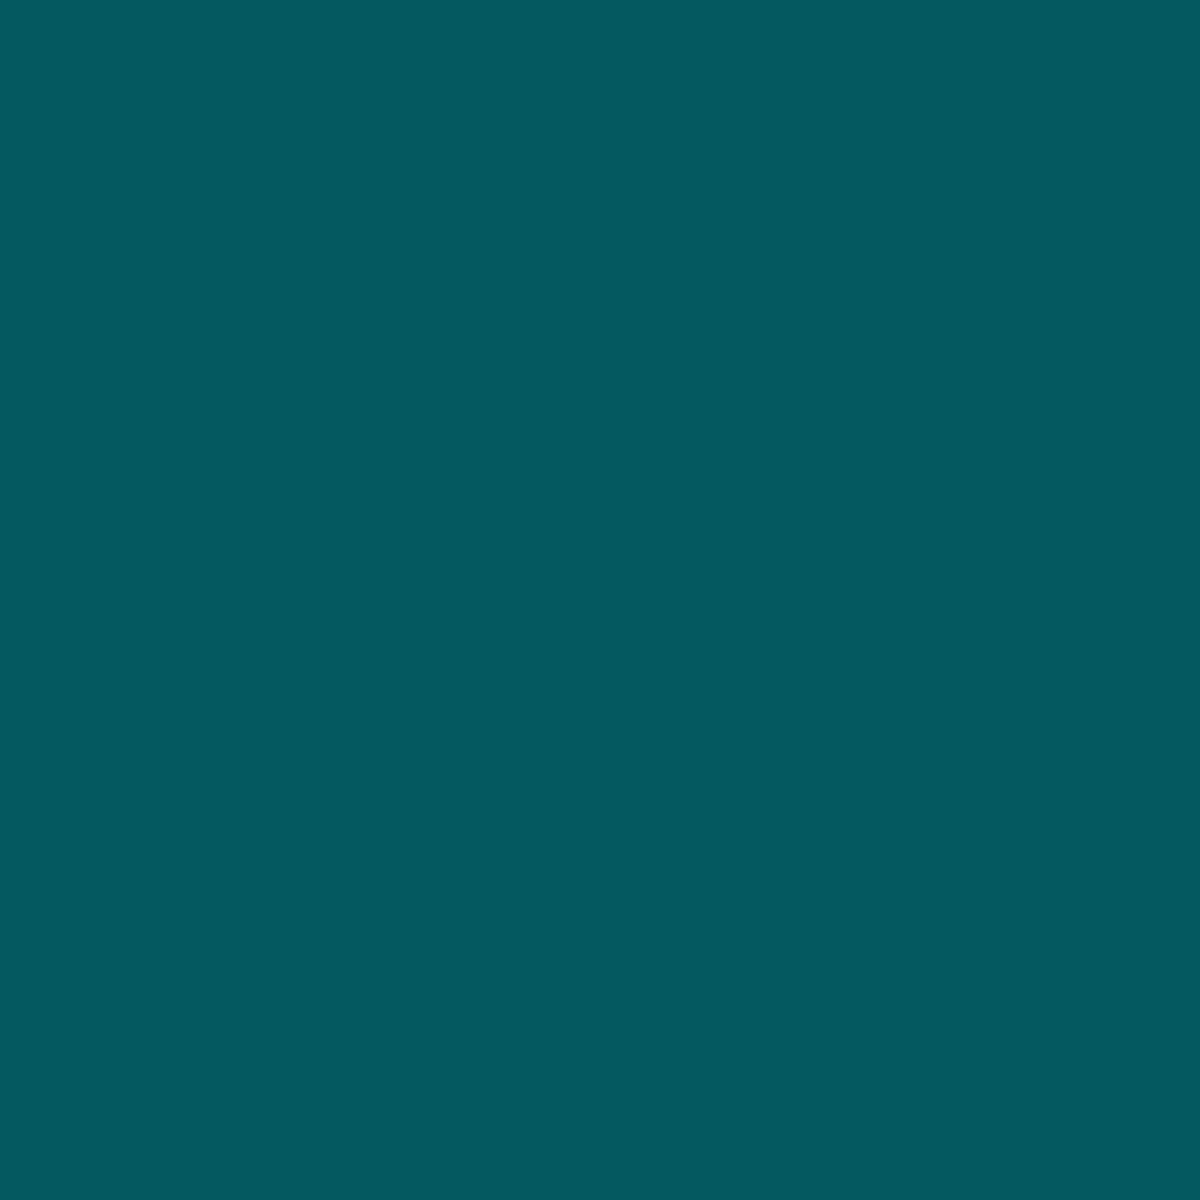 Blue Green  Dr Odd